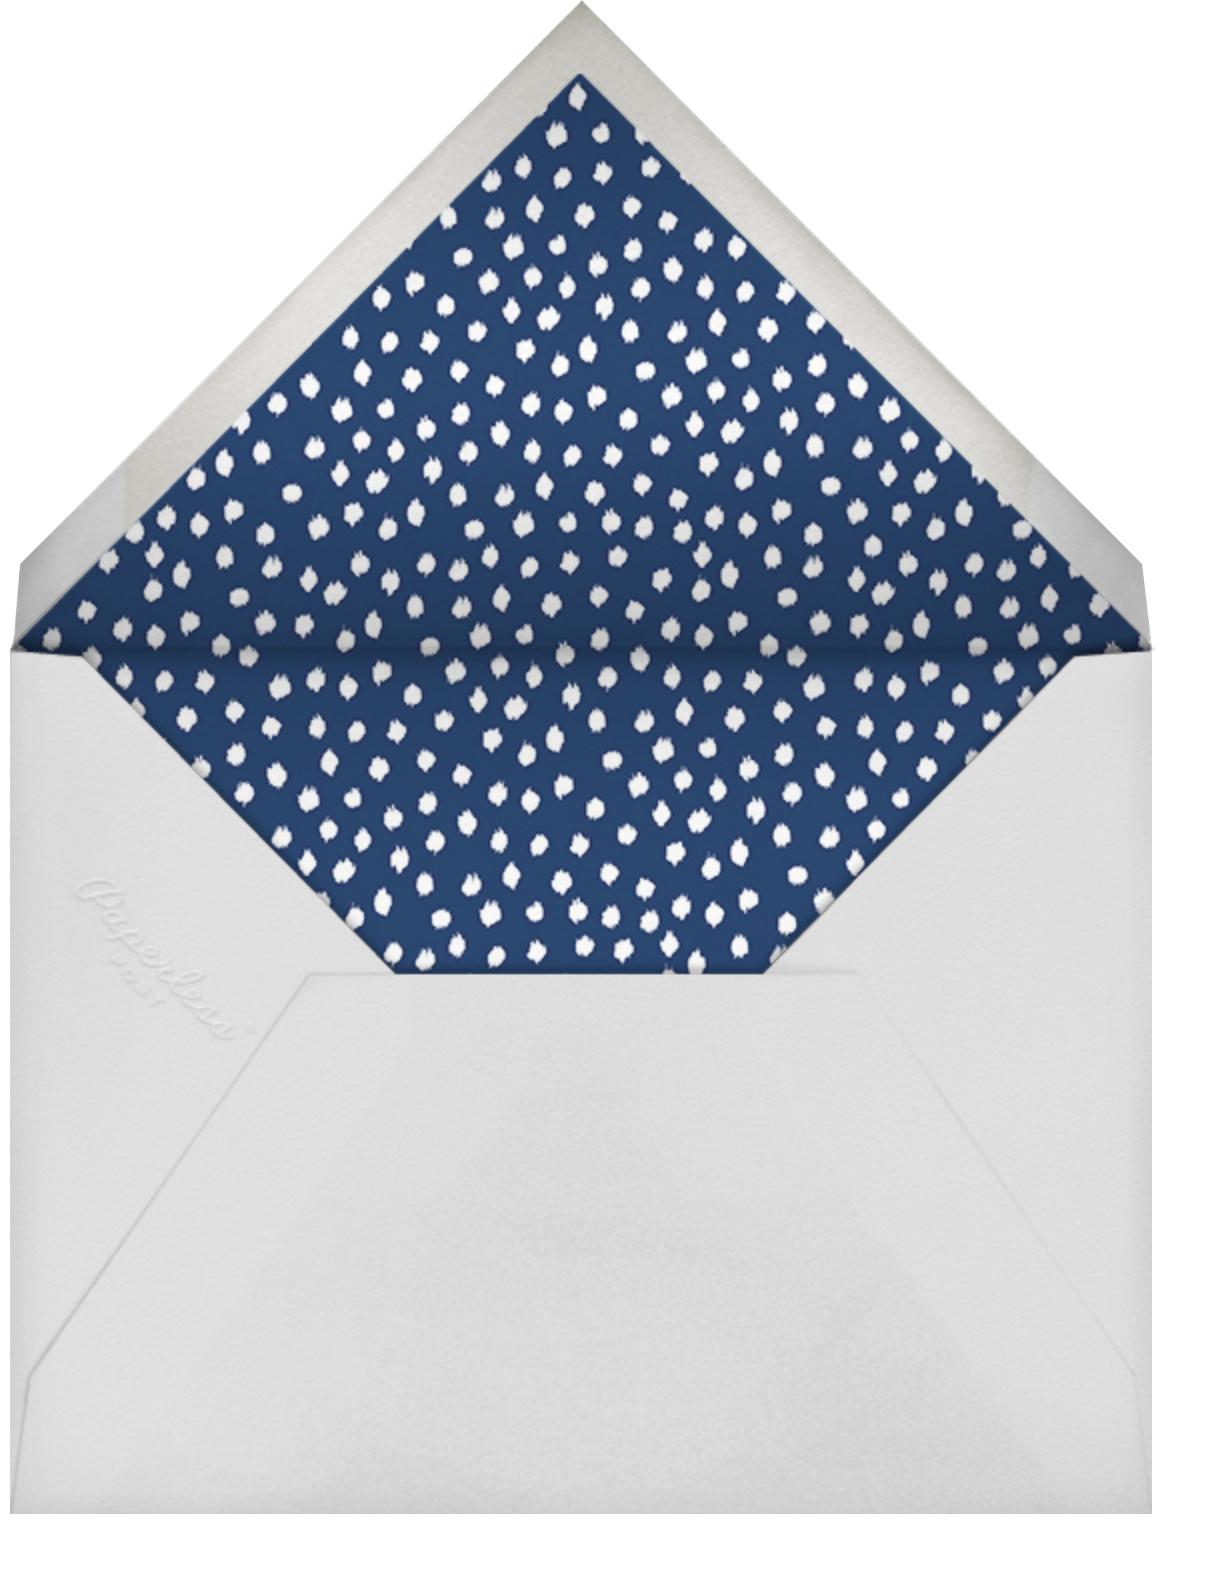 Ikat Dot - Dark Blue - Oscar de la Renta - All - envelope back